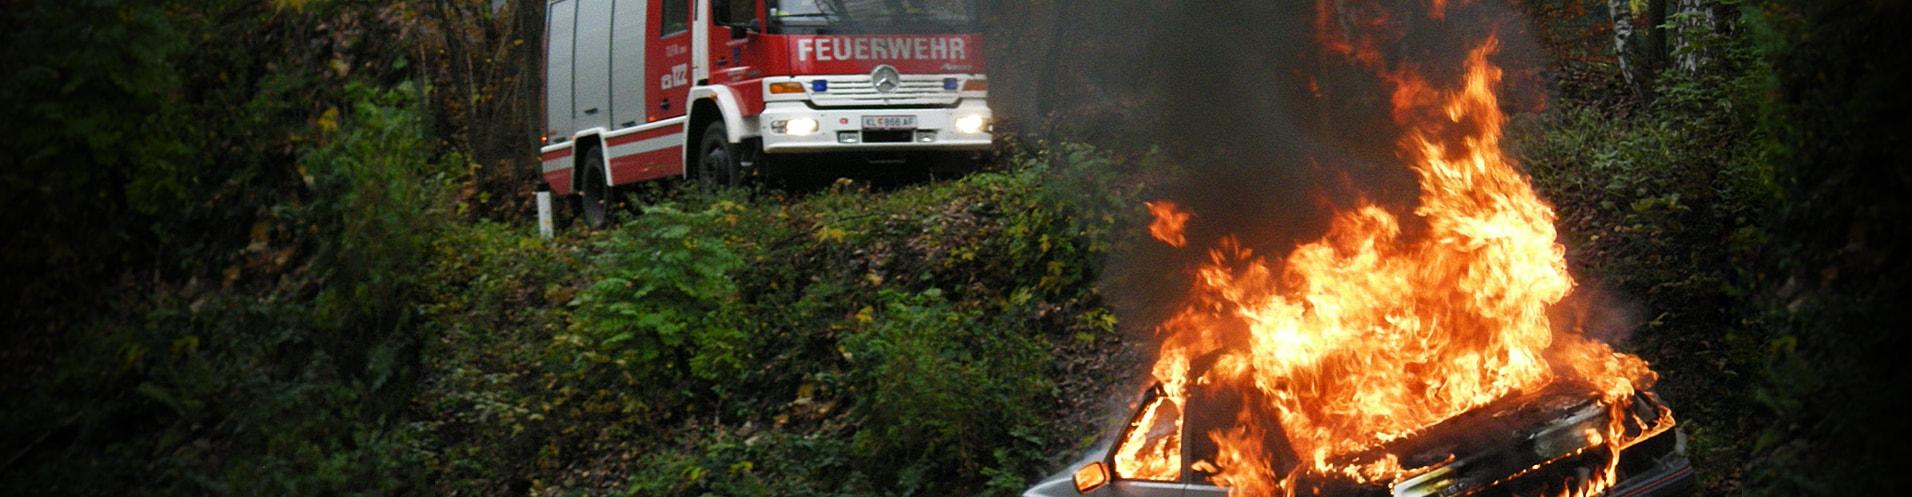 img-einsatz-autobrand